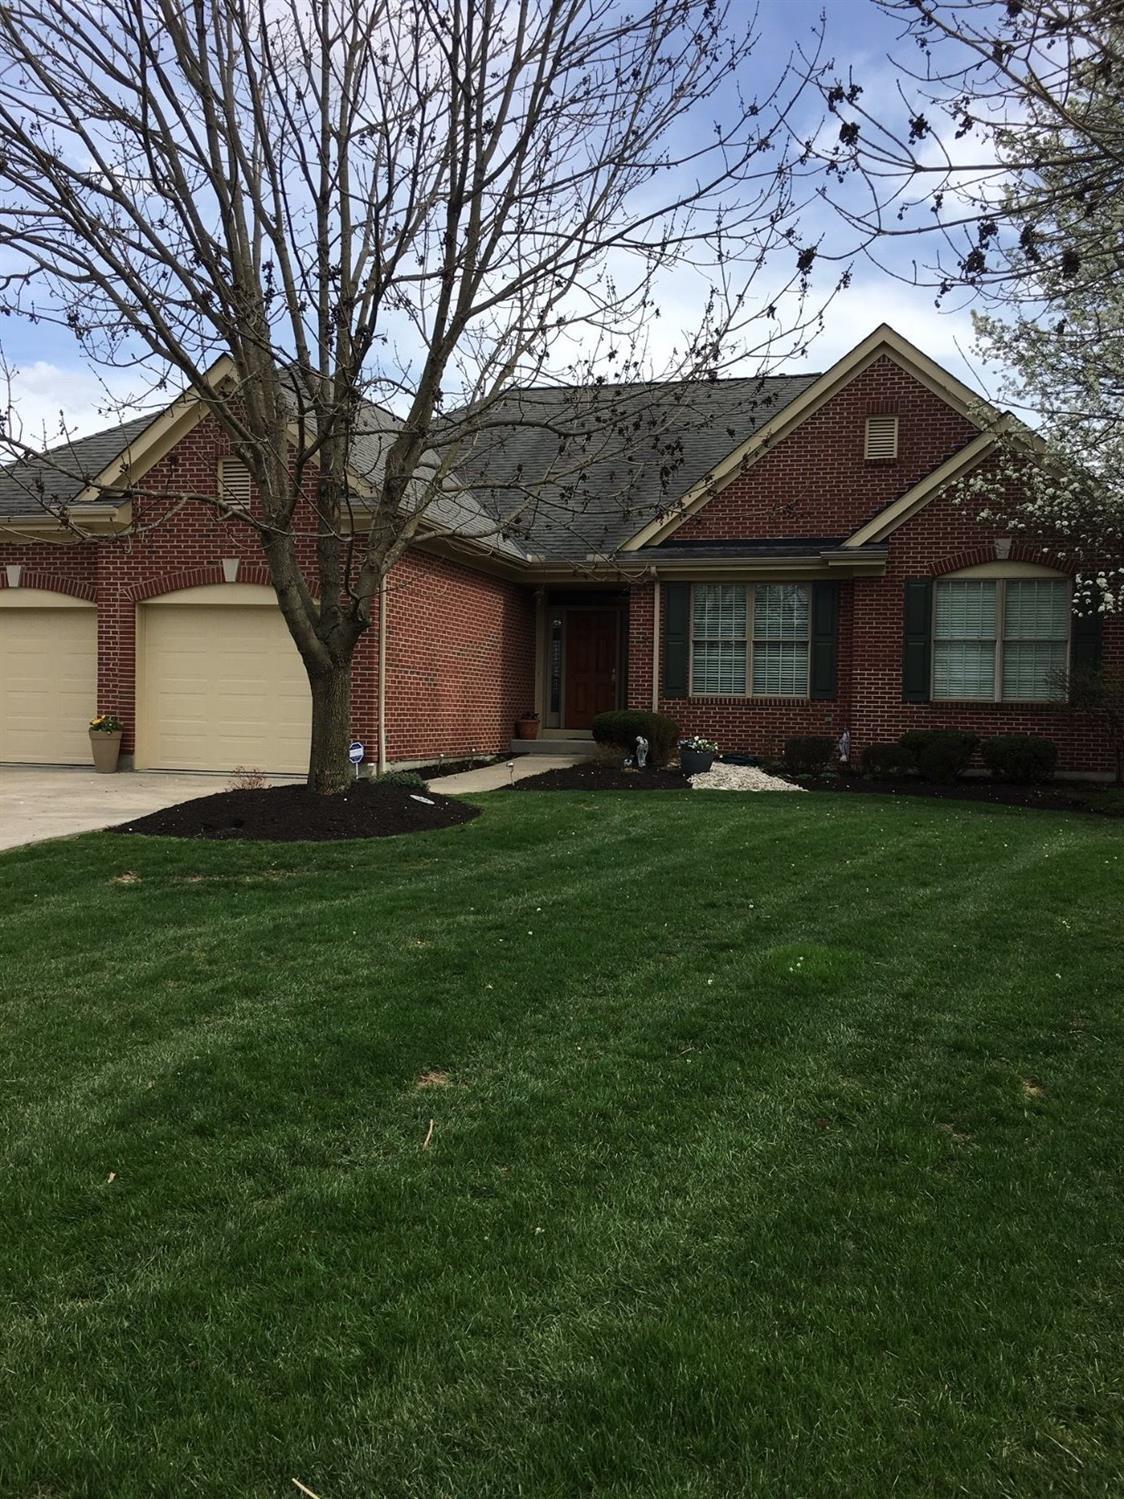 Property for sale at 11886 Whittington Lane, Sycamore Twp,  Ohio 45249